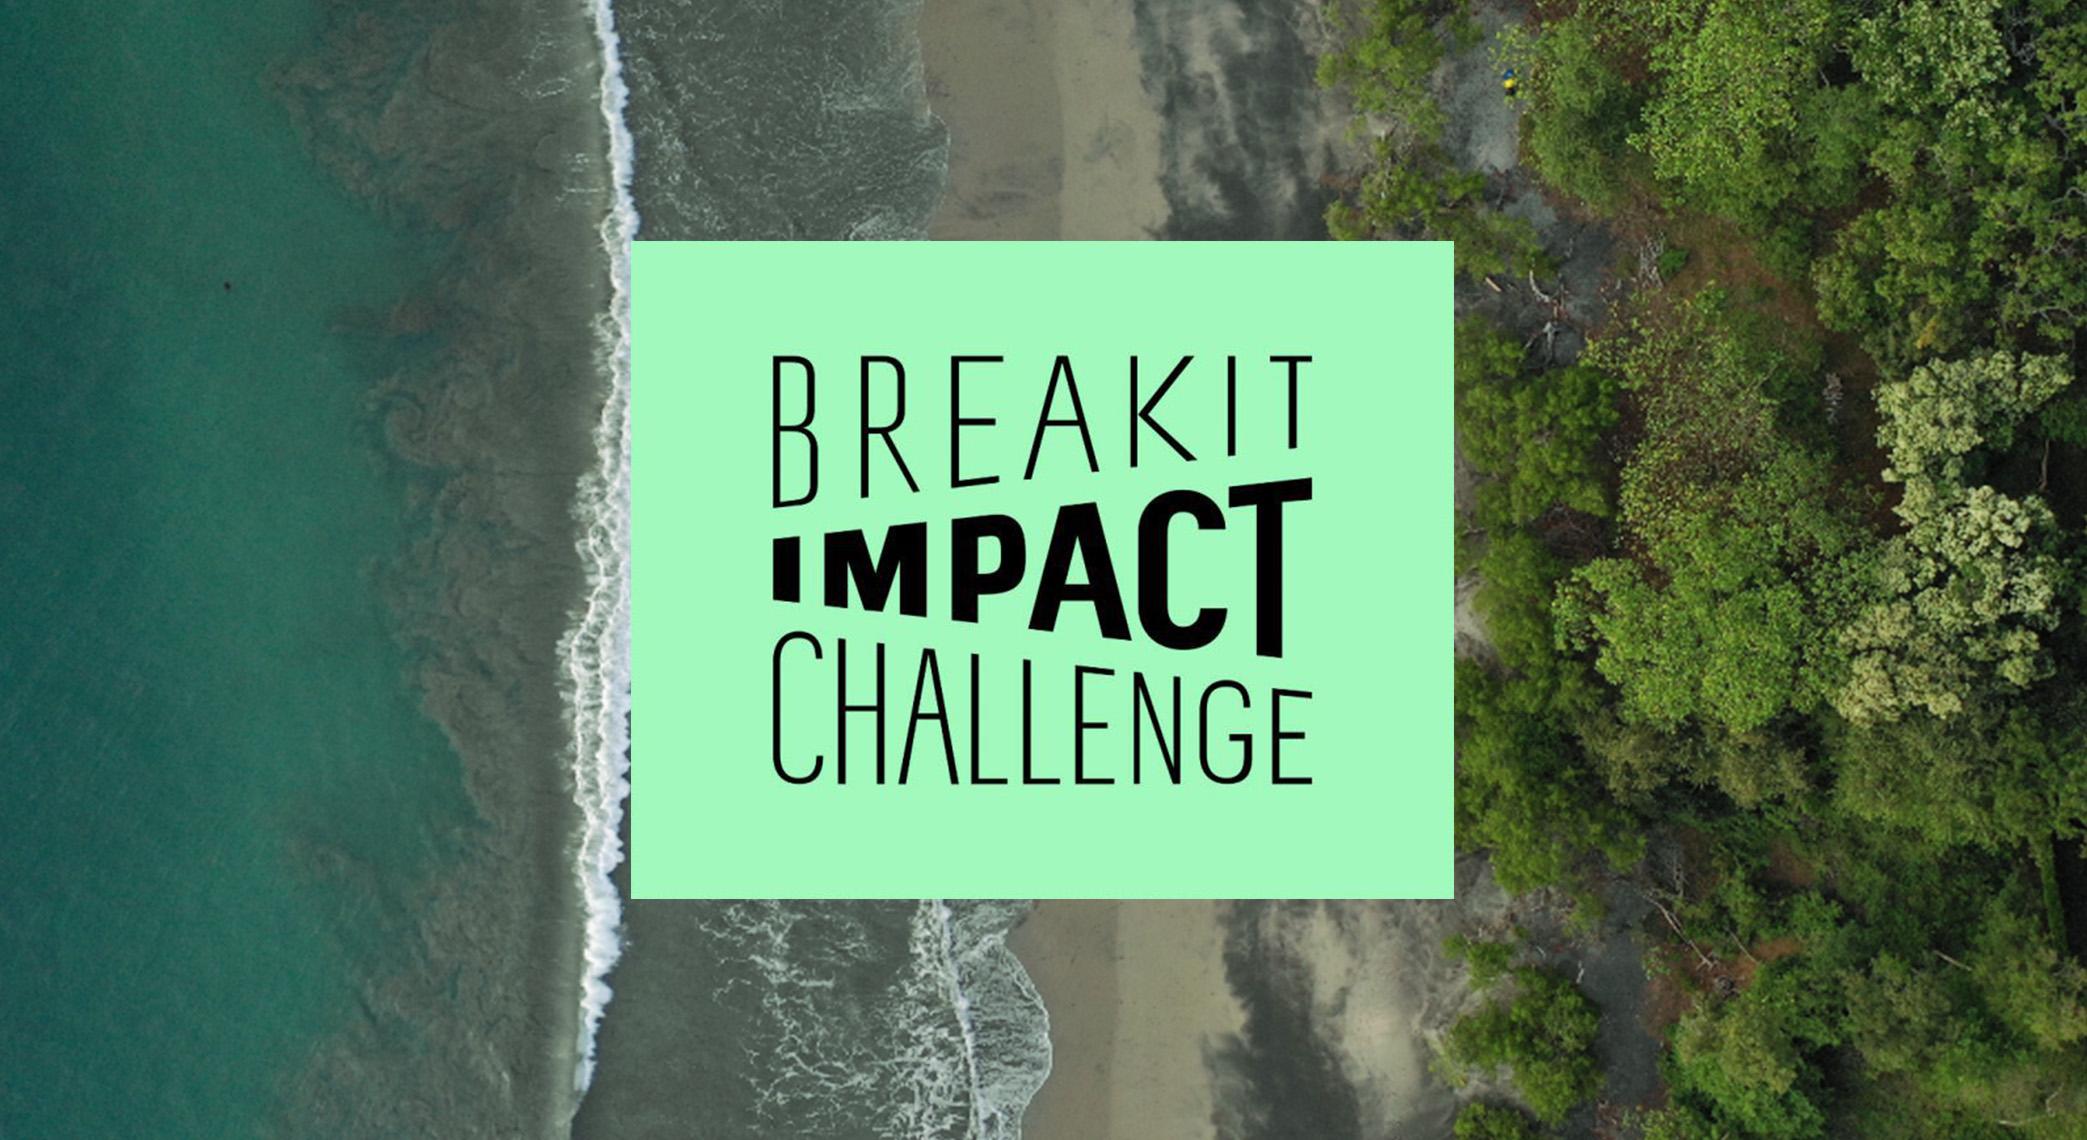 Spring deltar i Breakit Impact Challenge